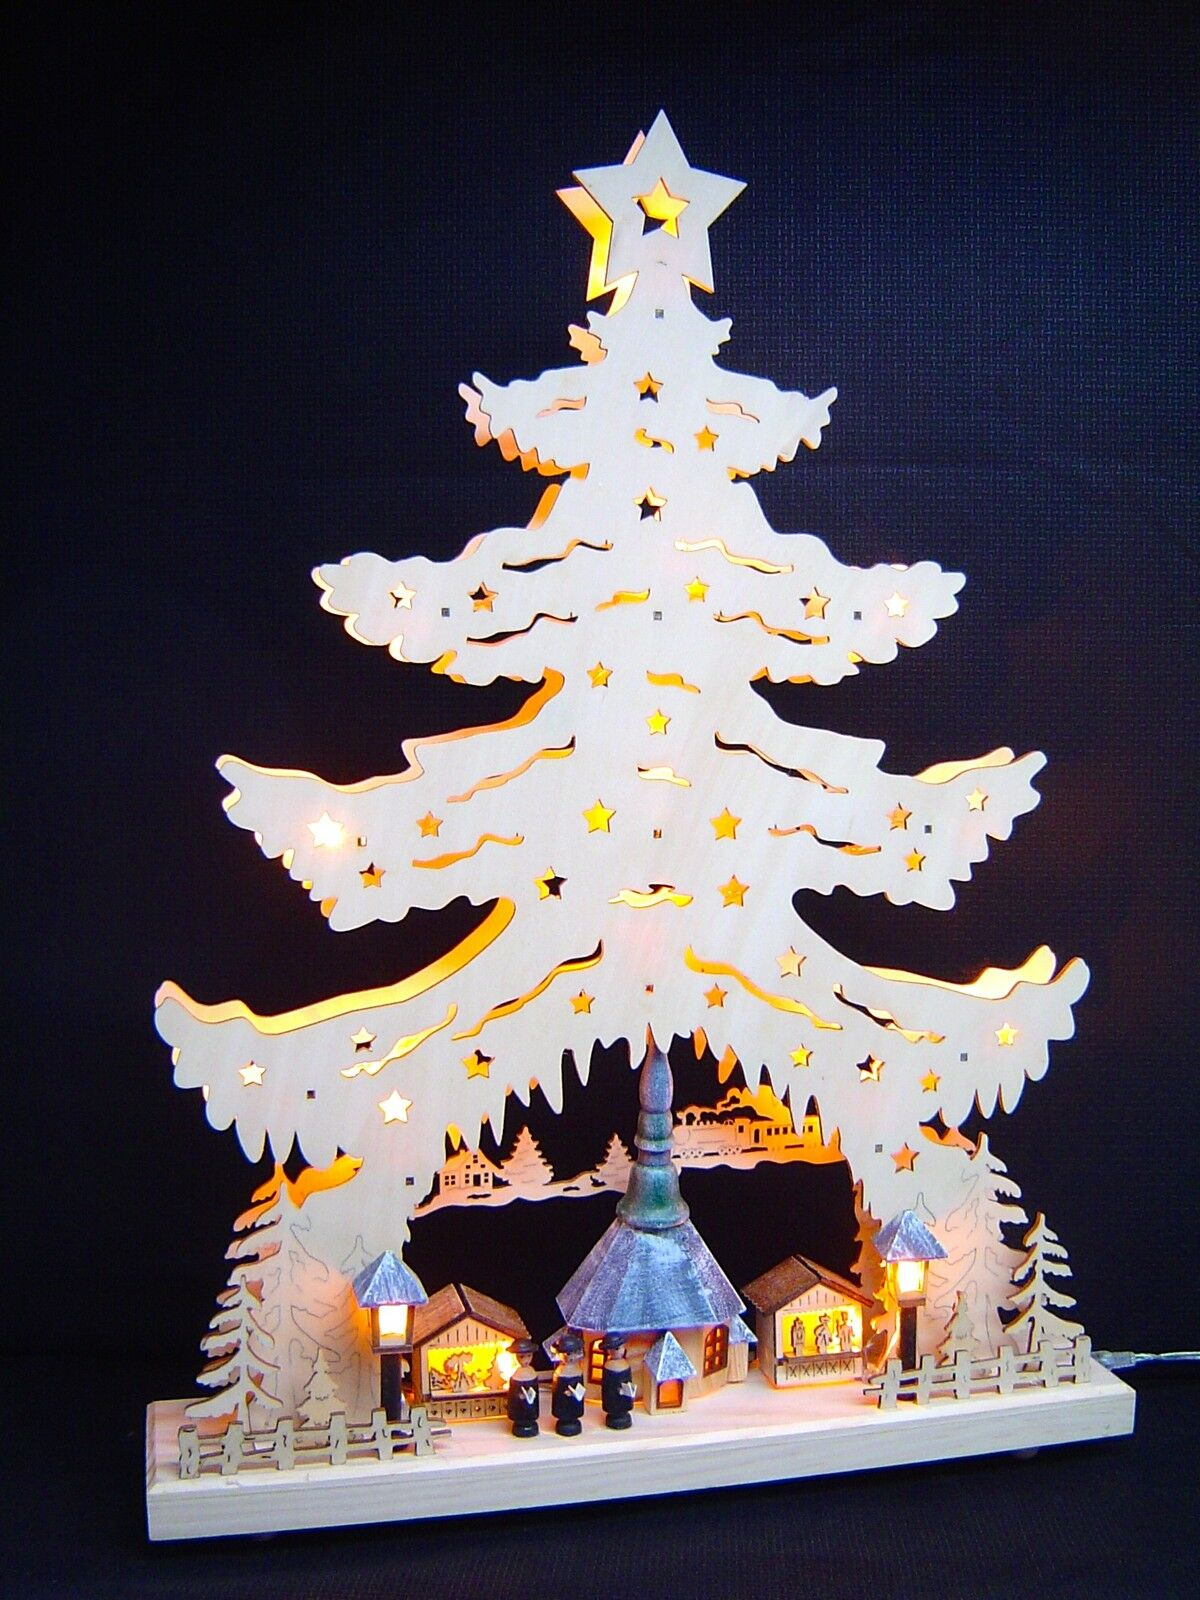 led lichterbogen schwibbogen spitze 3d seiffen kirche mit figuren 39x53 cm 10045 eur 62 99. Black Bedroom Furniture Sets. Home Design Ideas